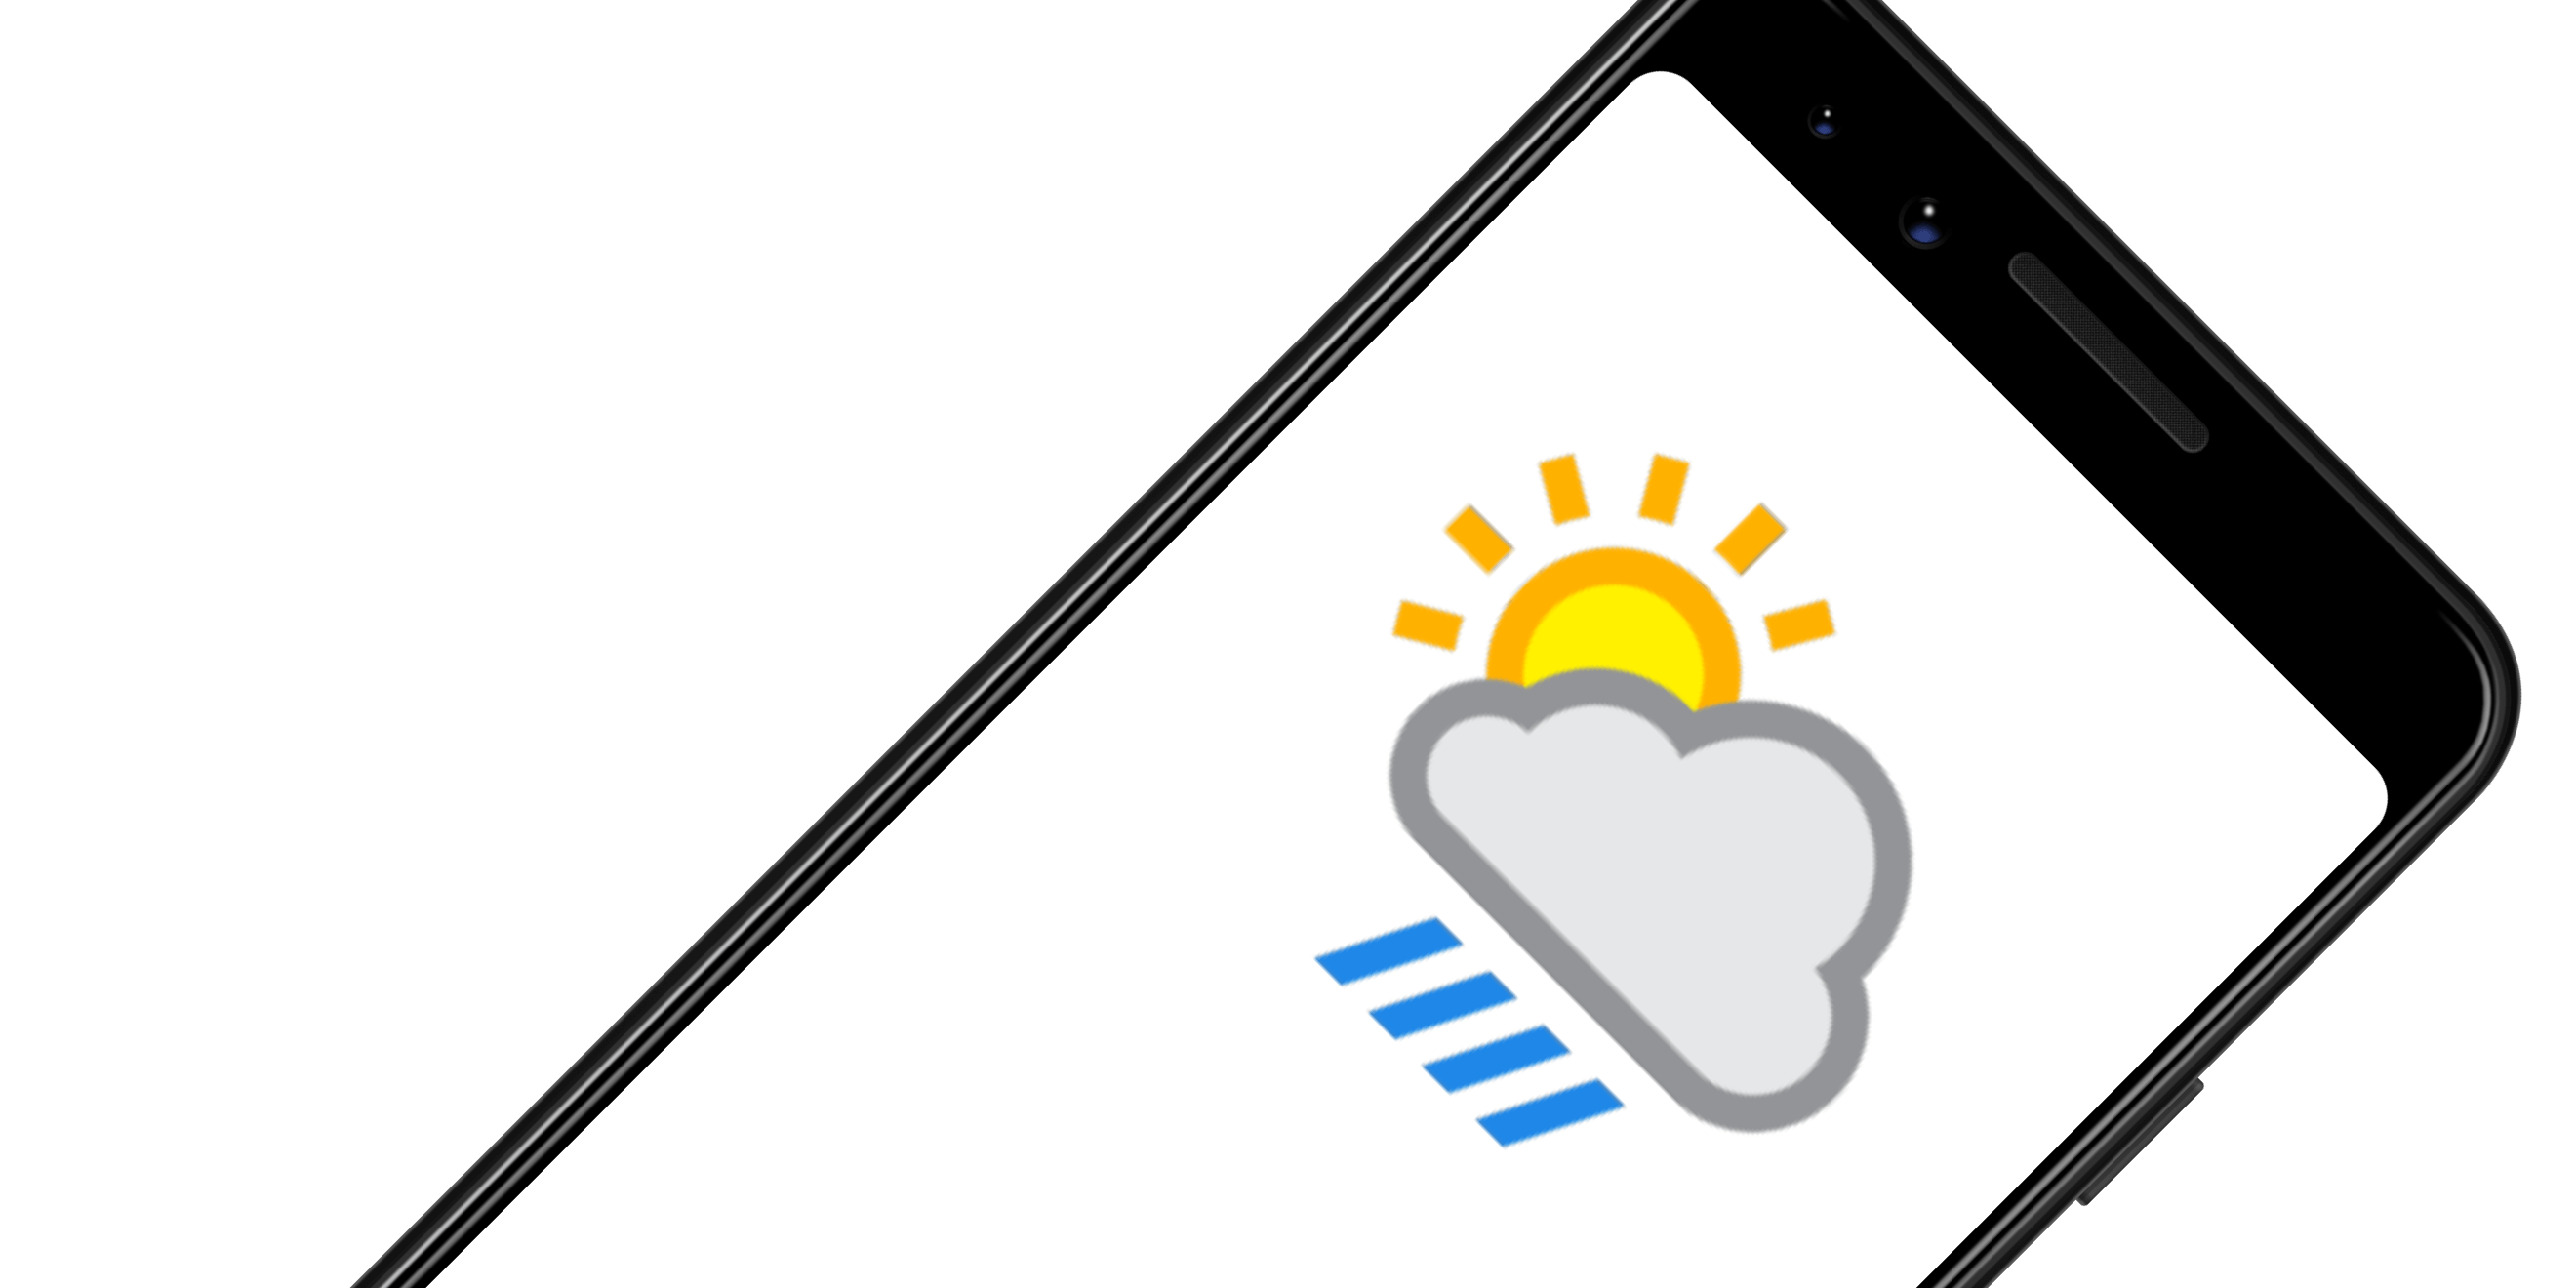 Как вывести погоду на экран андроида